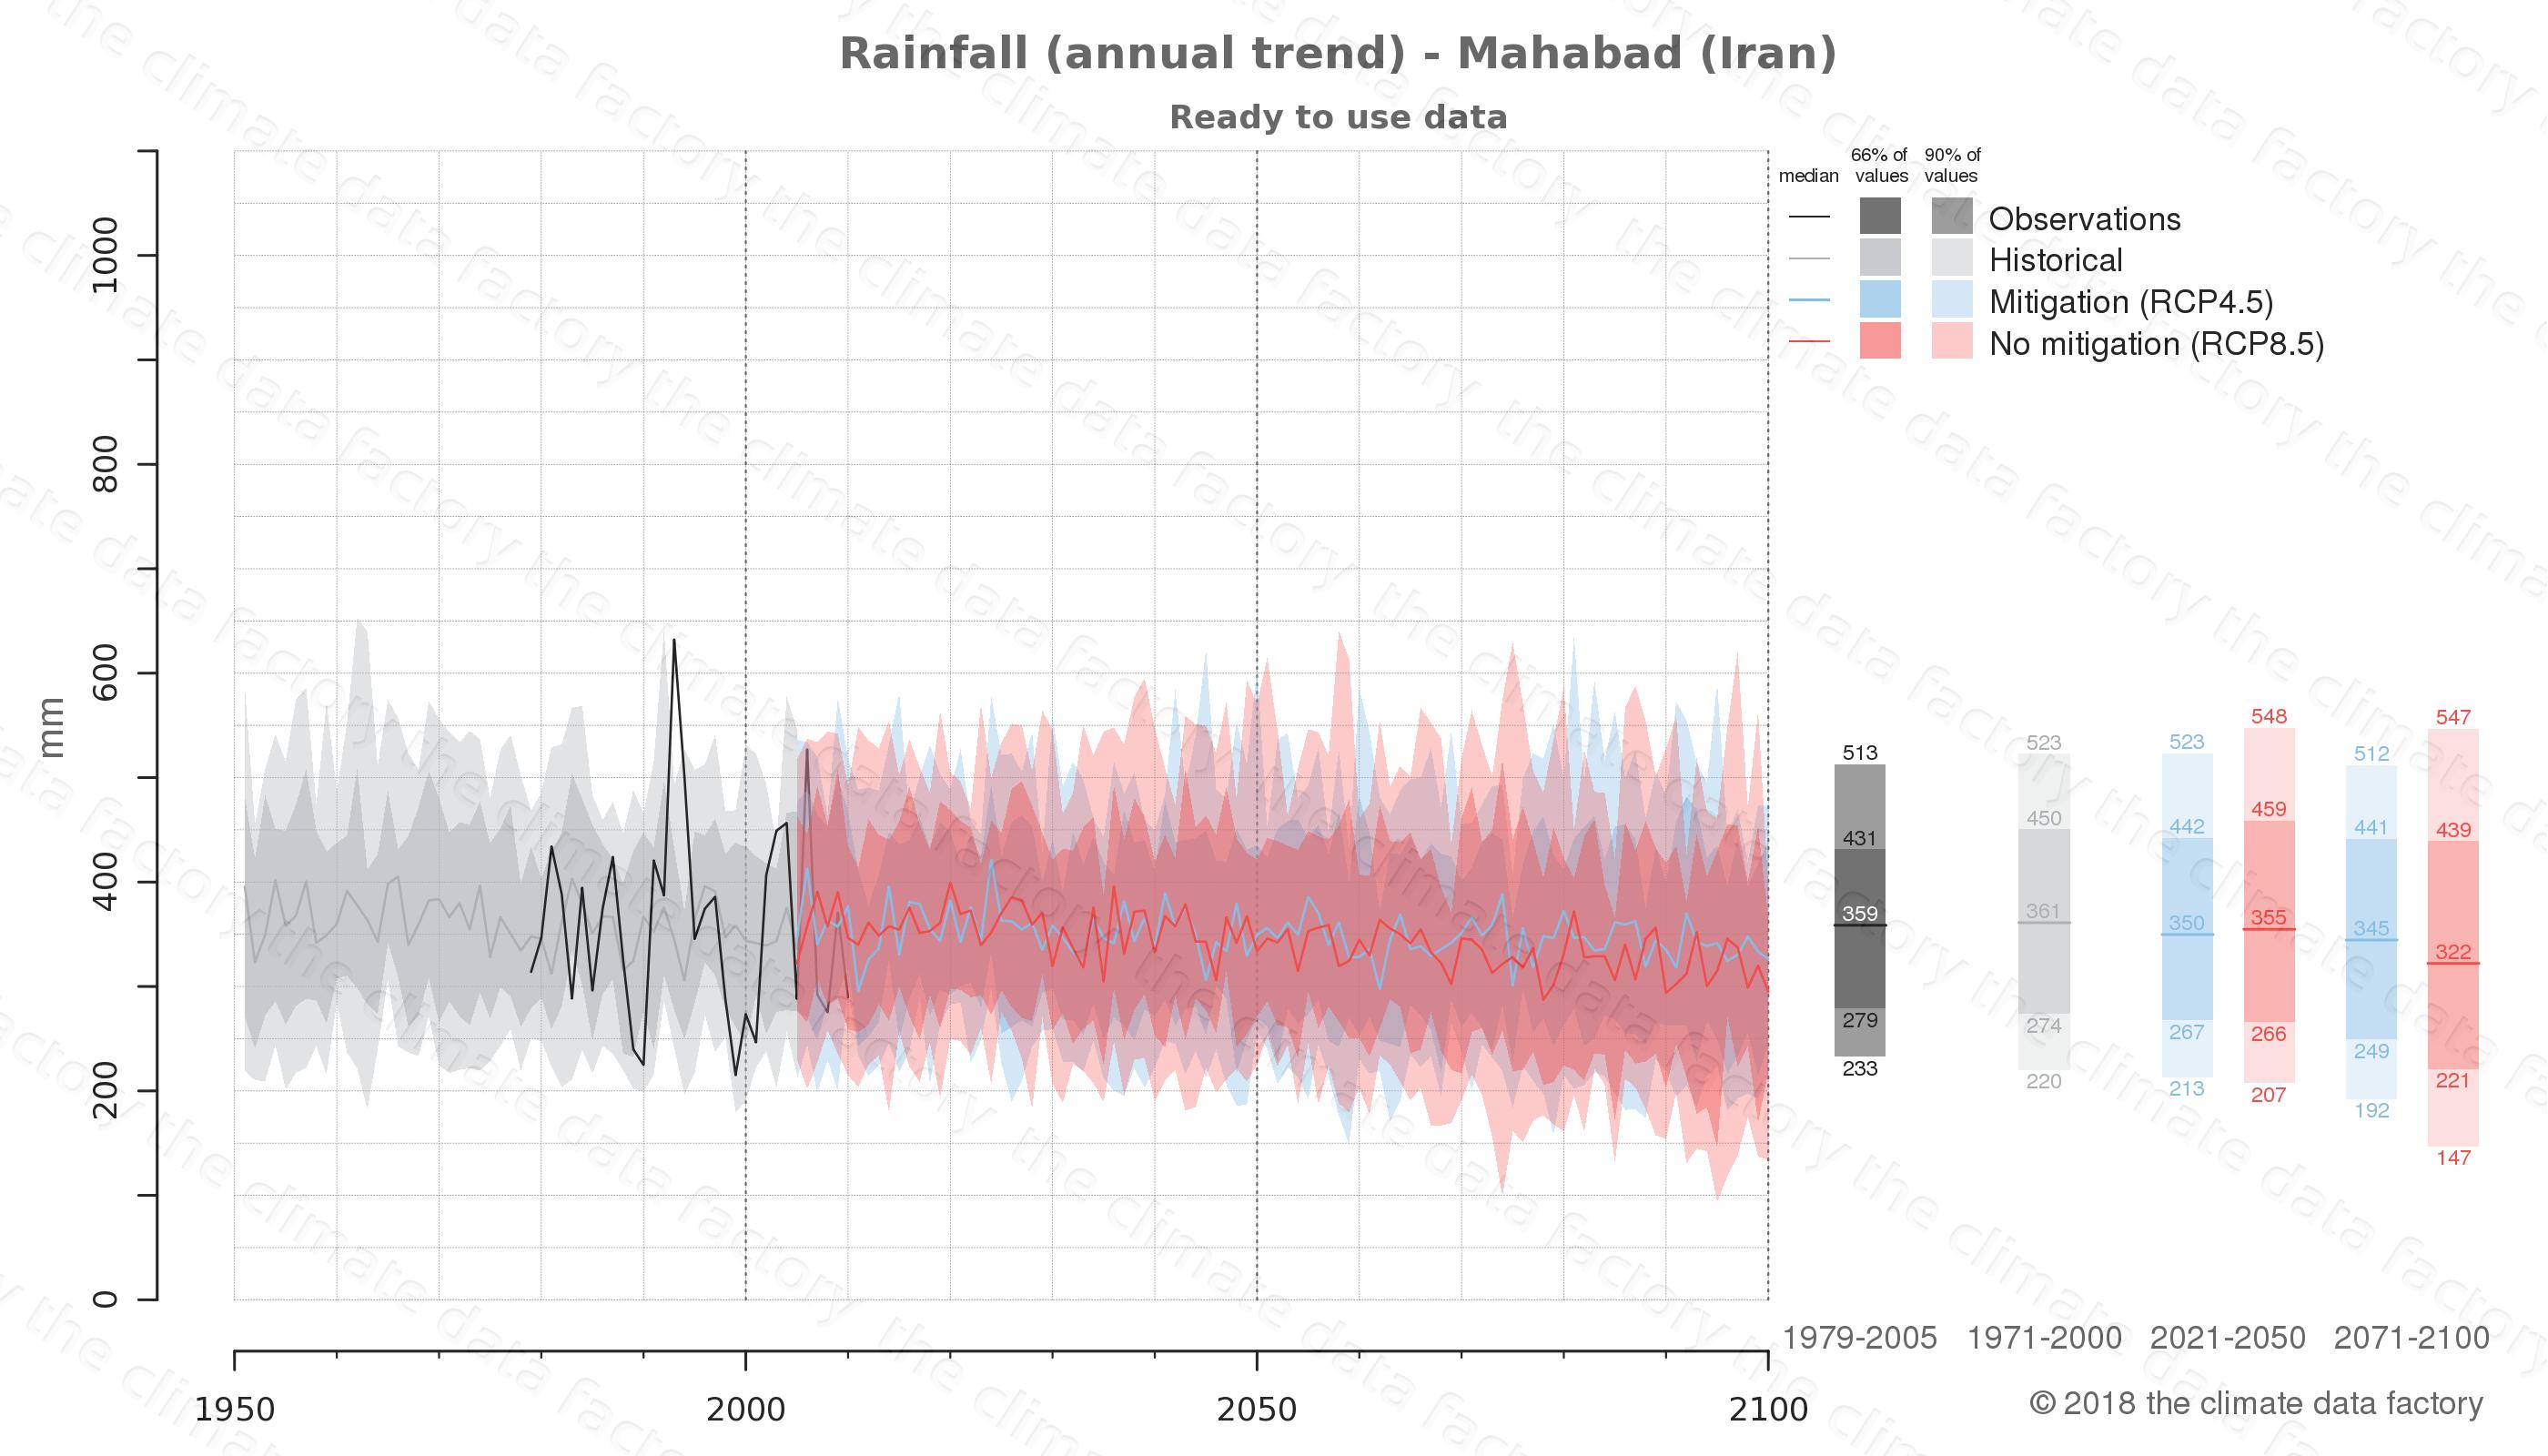 climate change data policy adaptation climate graph city data rainfall mahabad iran